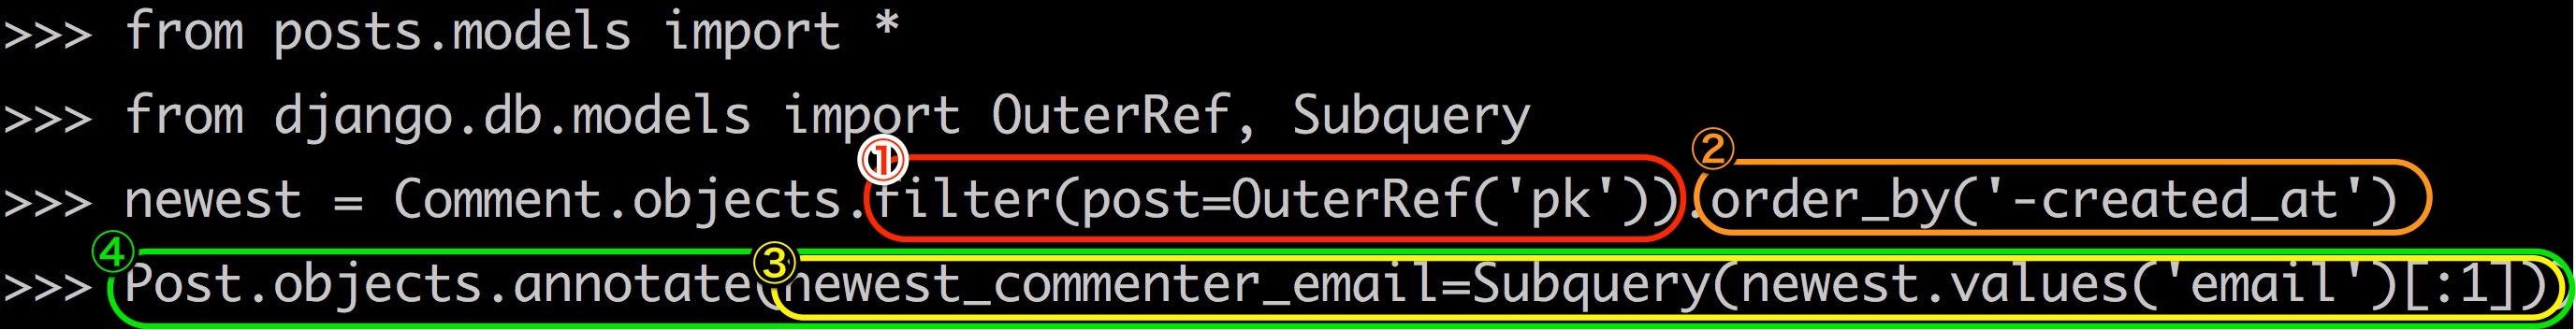 Subquery-python.jpg